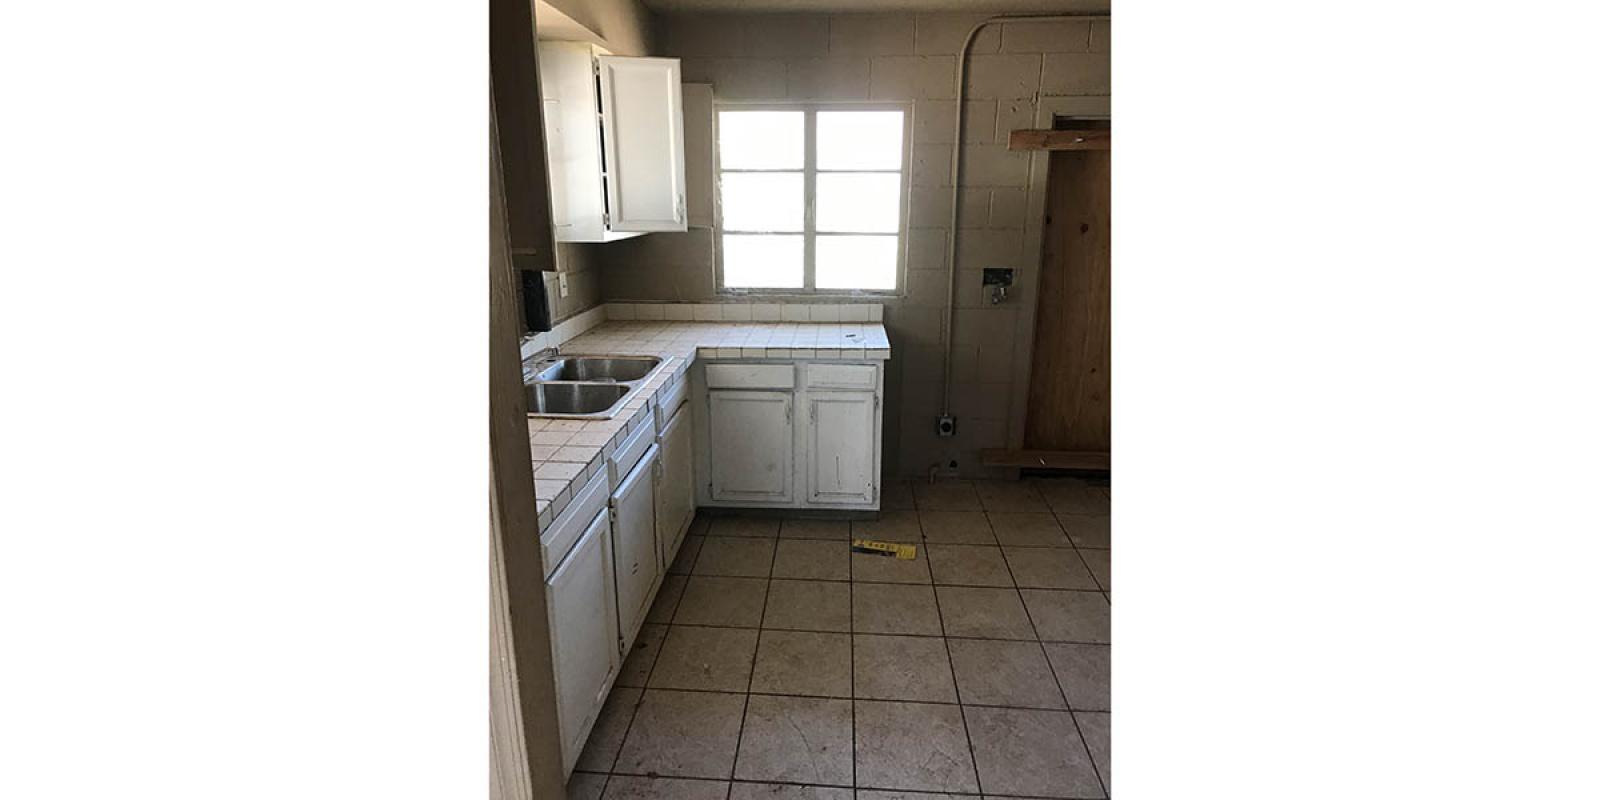 905 W Peoria Ave, Phoenix, Arizona 85029, ,SFR,Available,W Peoria Ave,1195